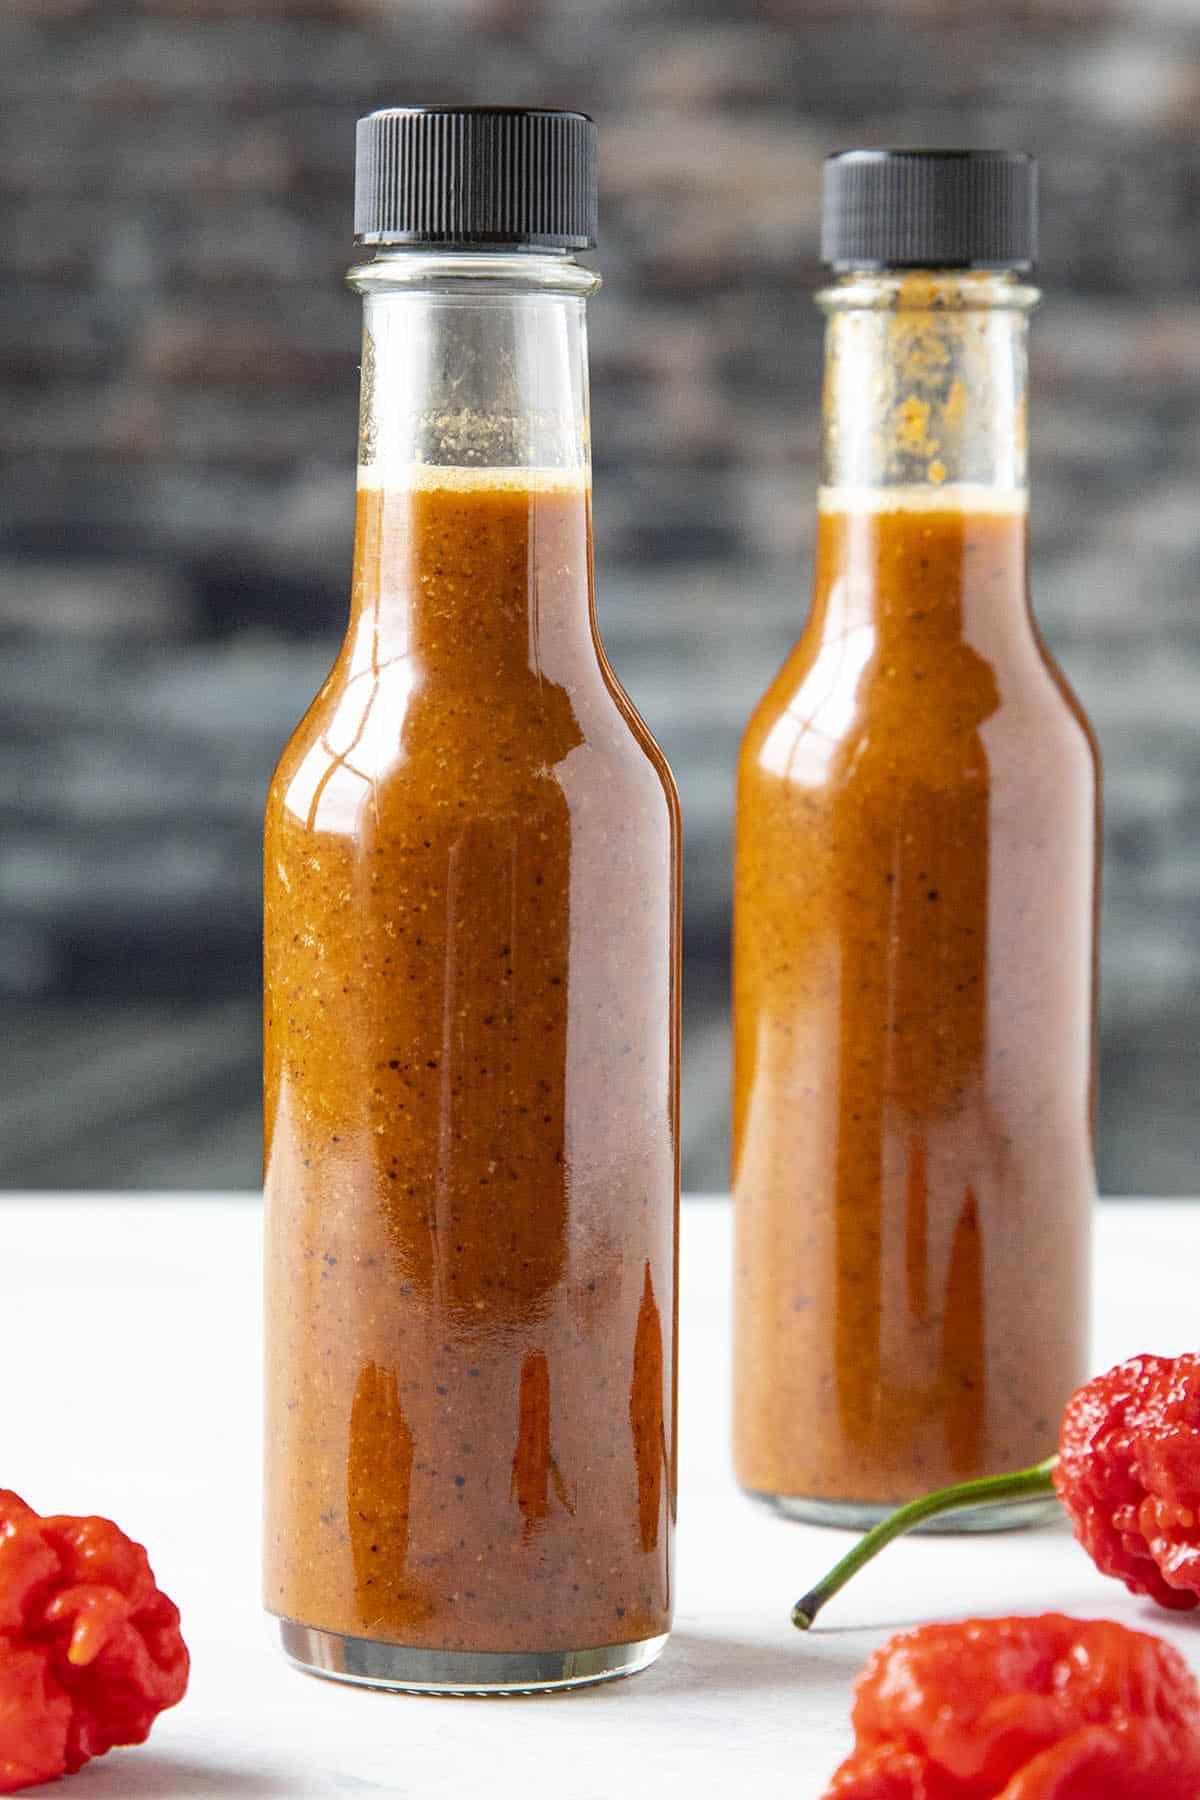 2 bottles of Carolina Reaper Hot Sauce